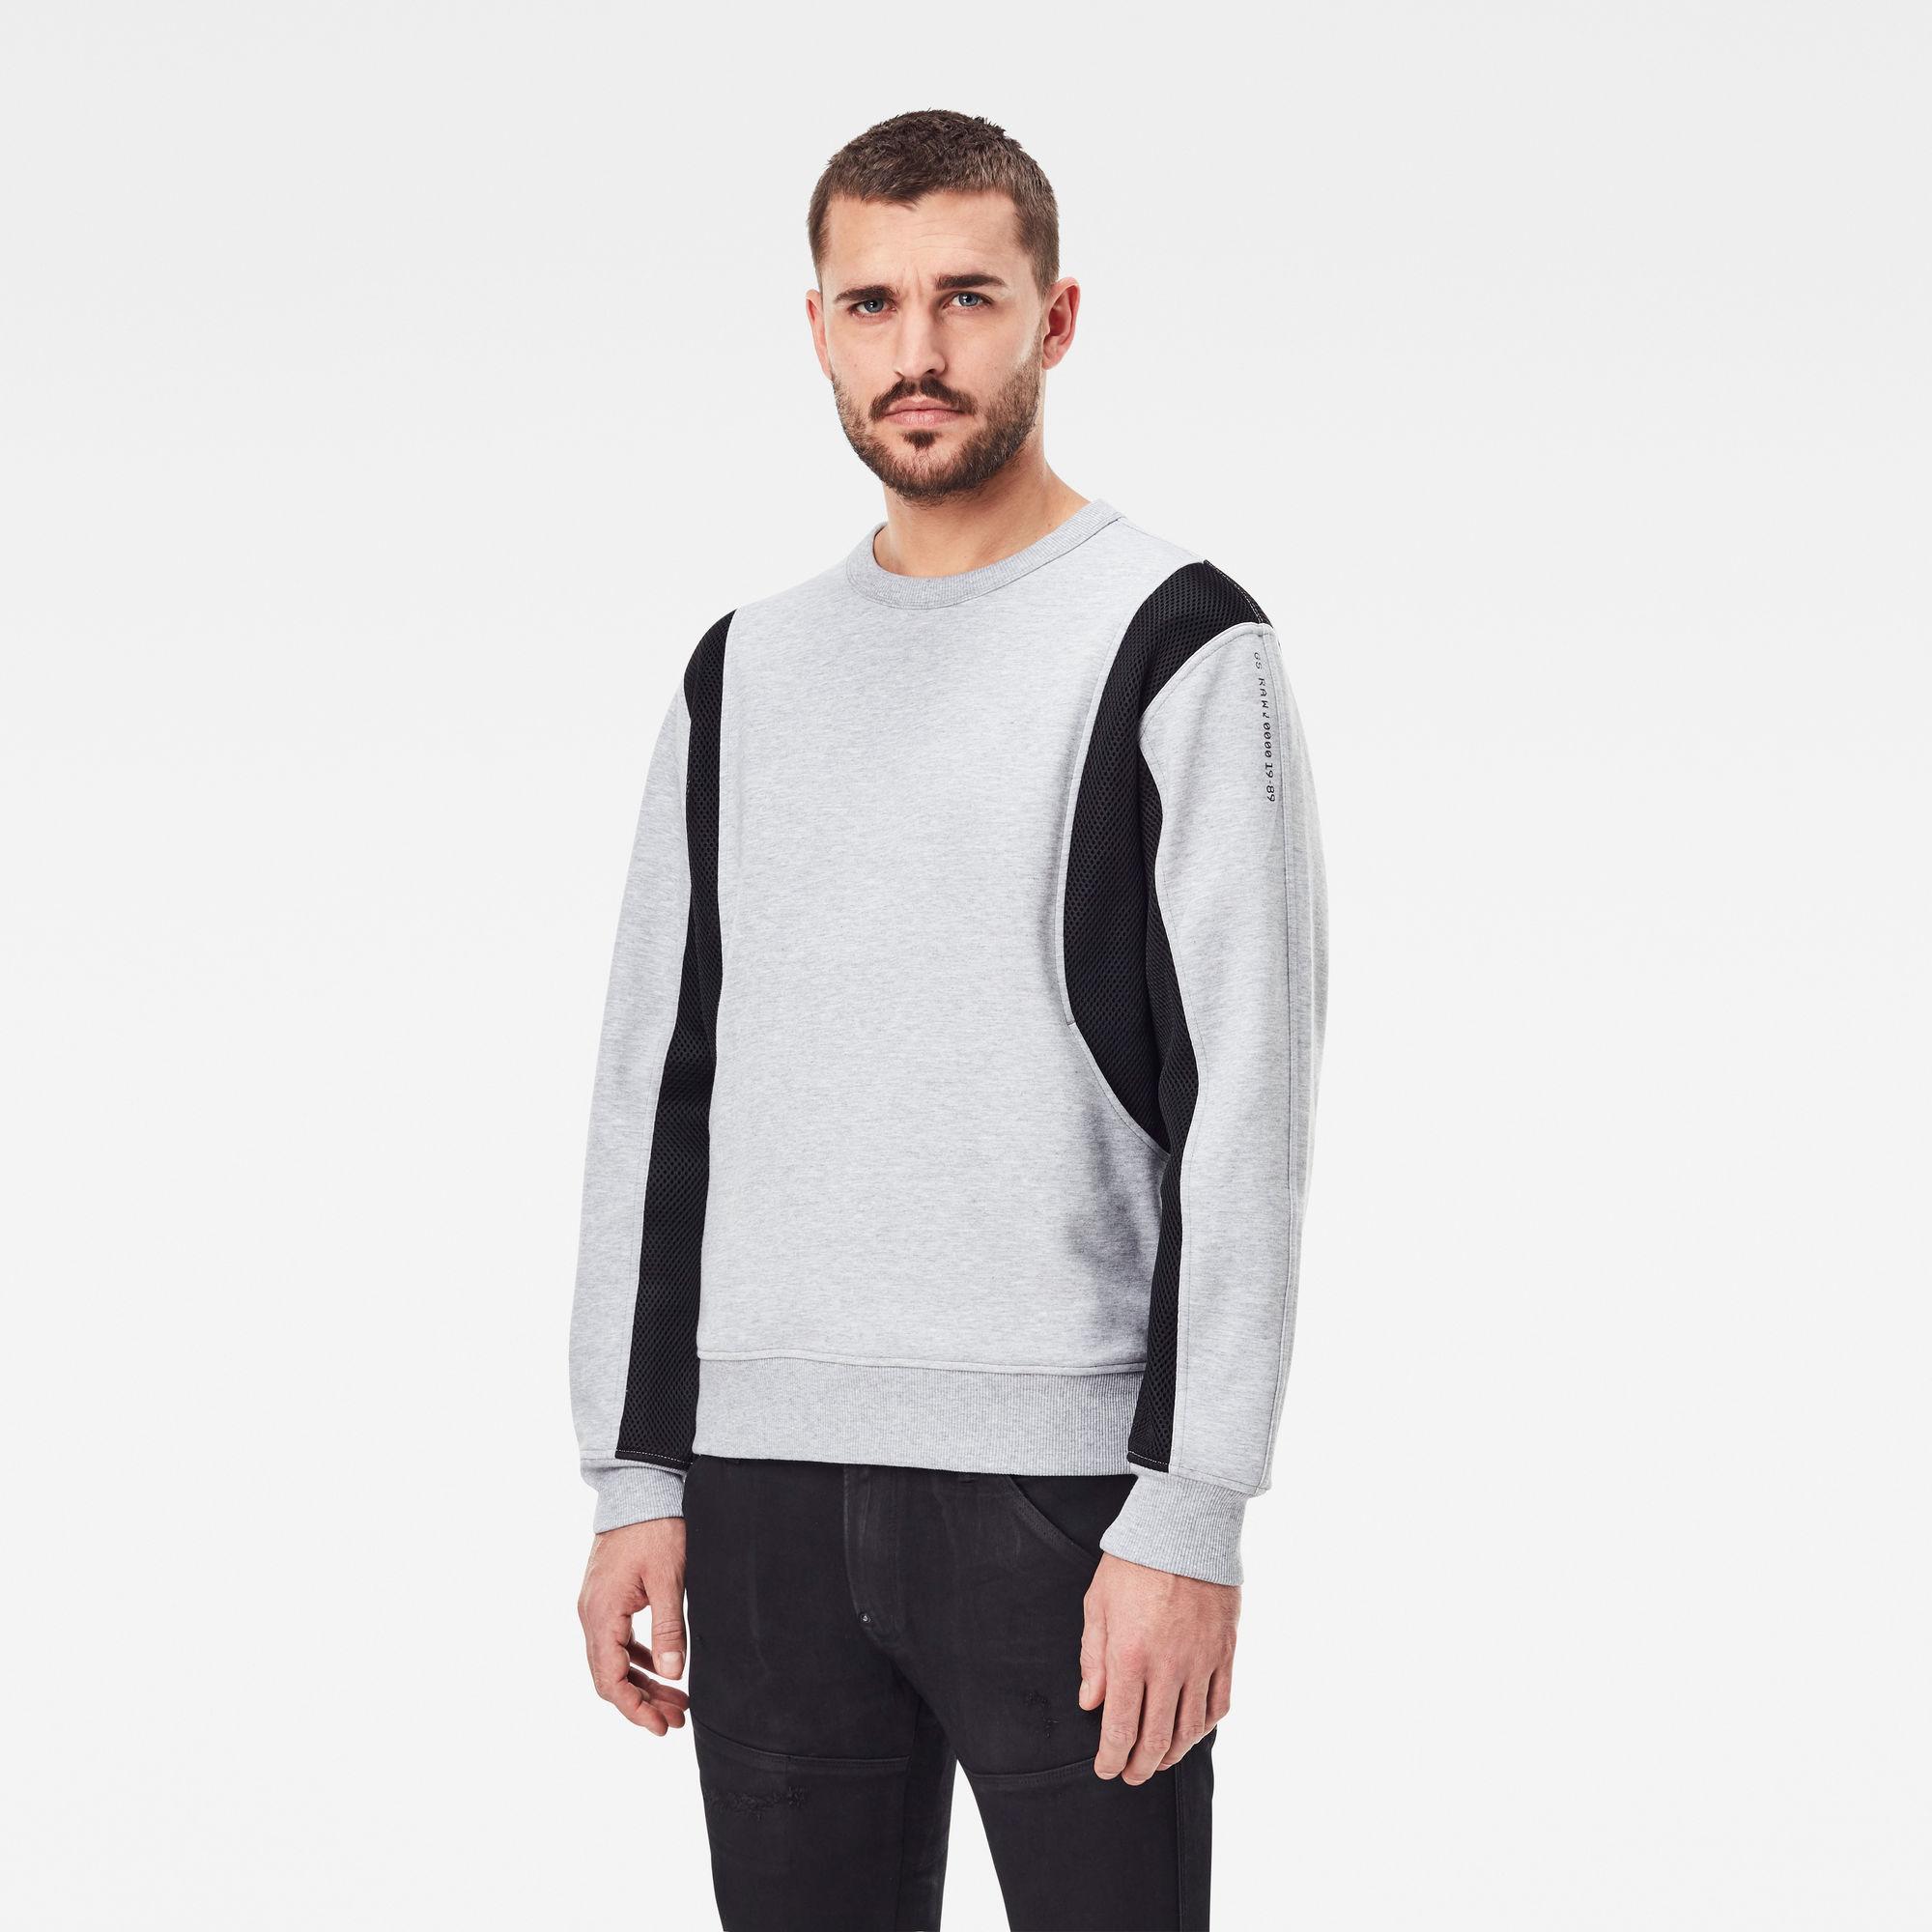 G-Star RAW Heren Moto Mesh Sweater Grijs